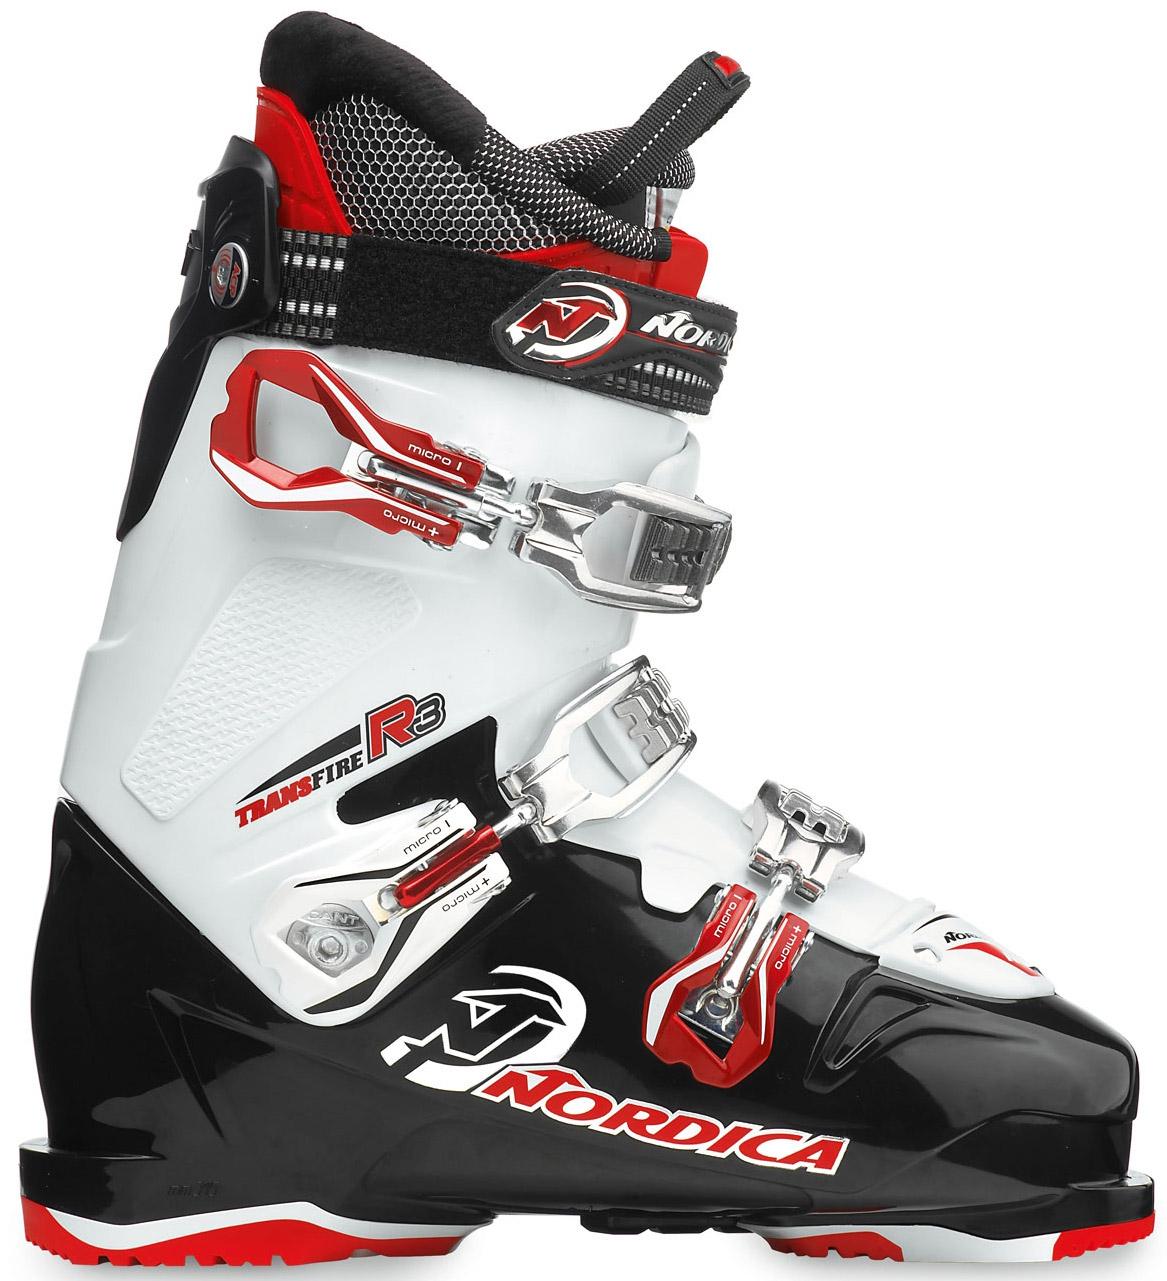 Nordica Transfire R3 Ski Boot 2013 Mount Everest